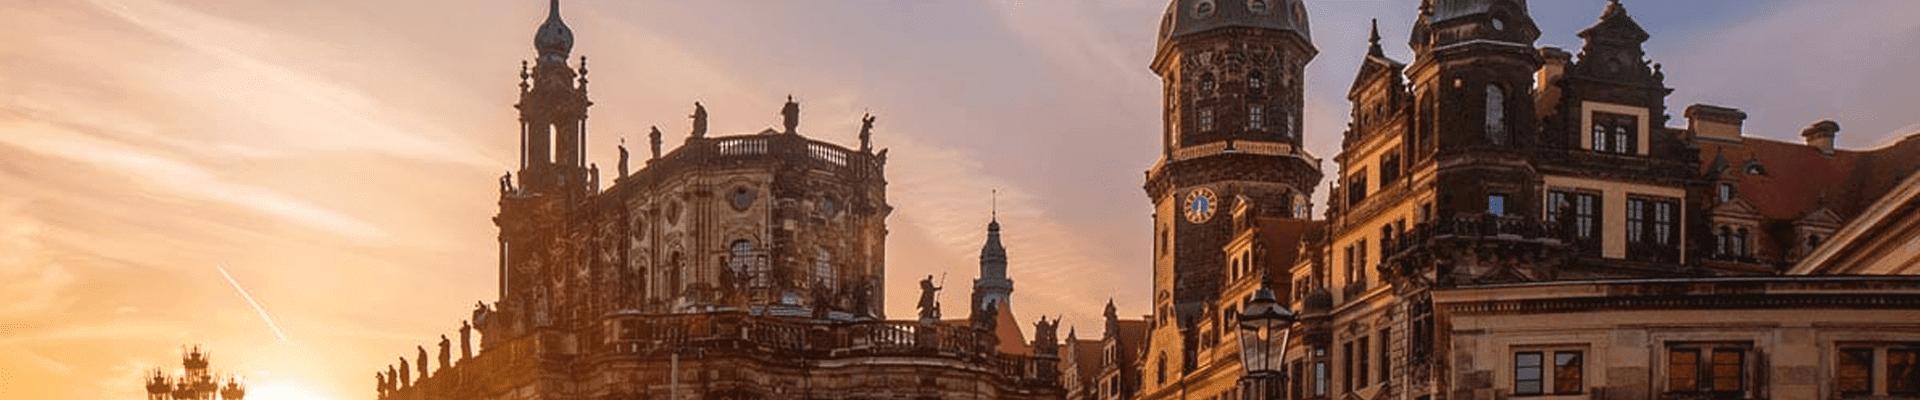 SEO Agentur Dresden